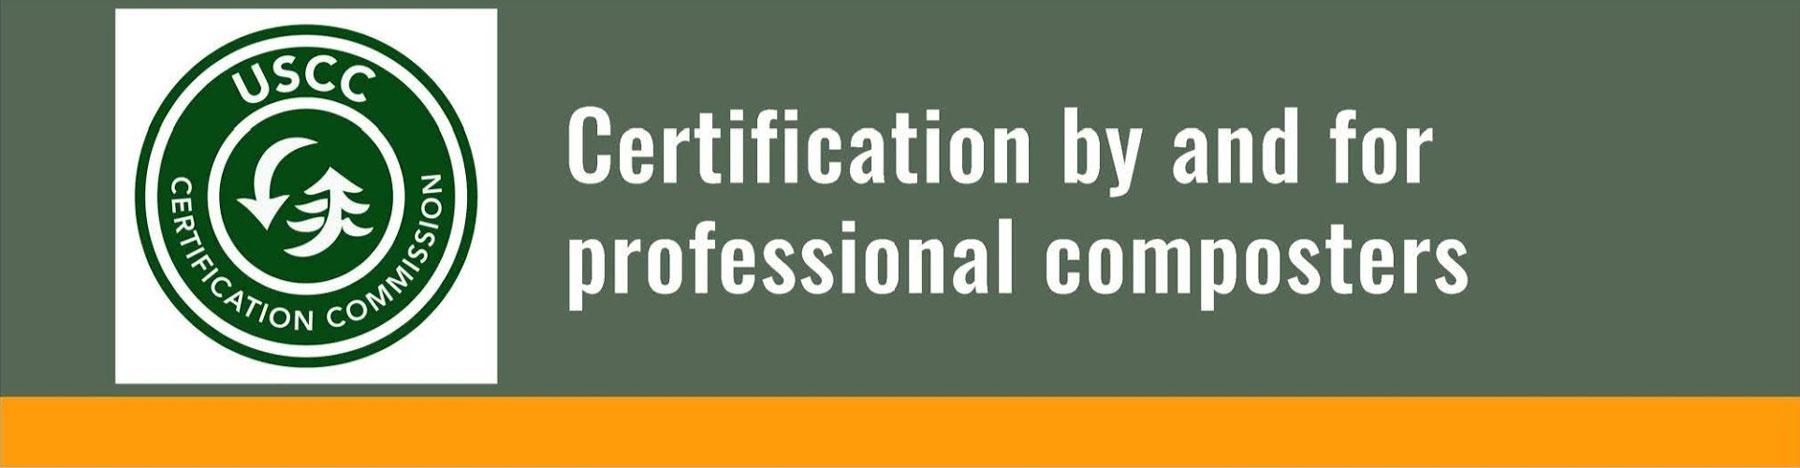 ccp ccom certification renewal